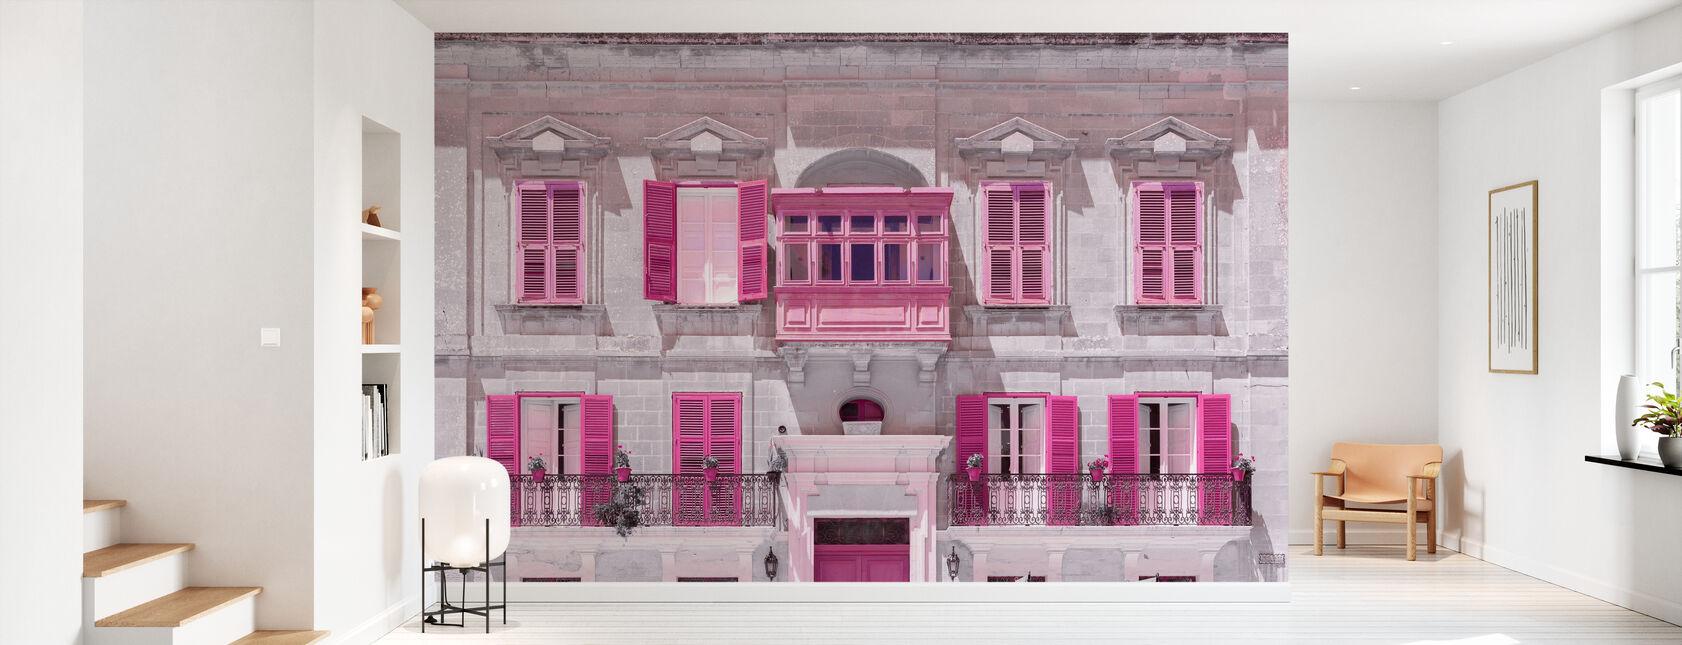 Malta Facade - Pink - Wallpaper - Hallway